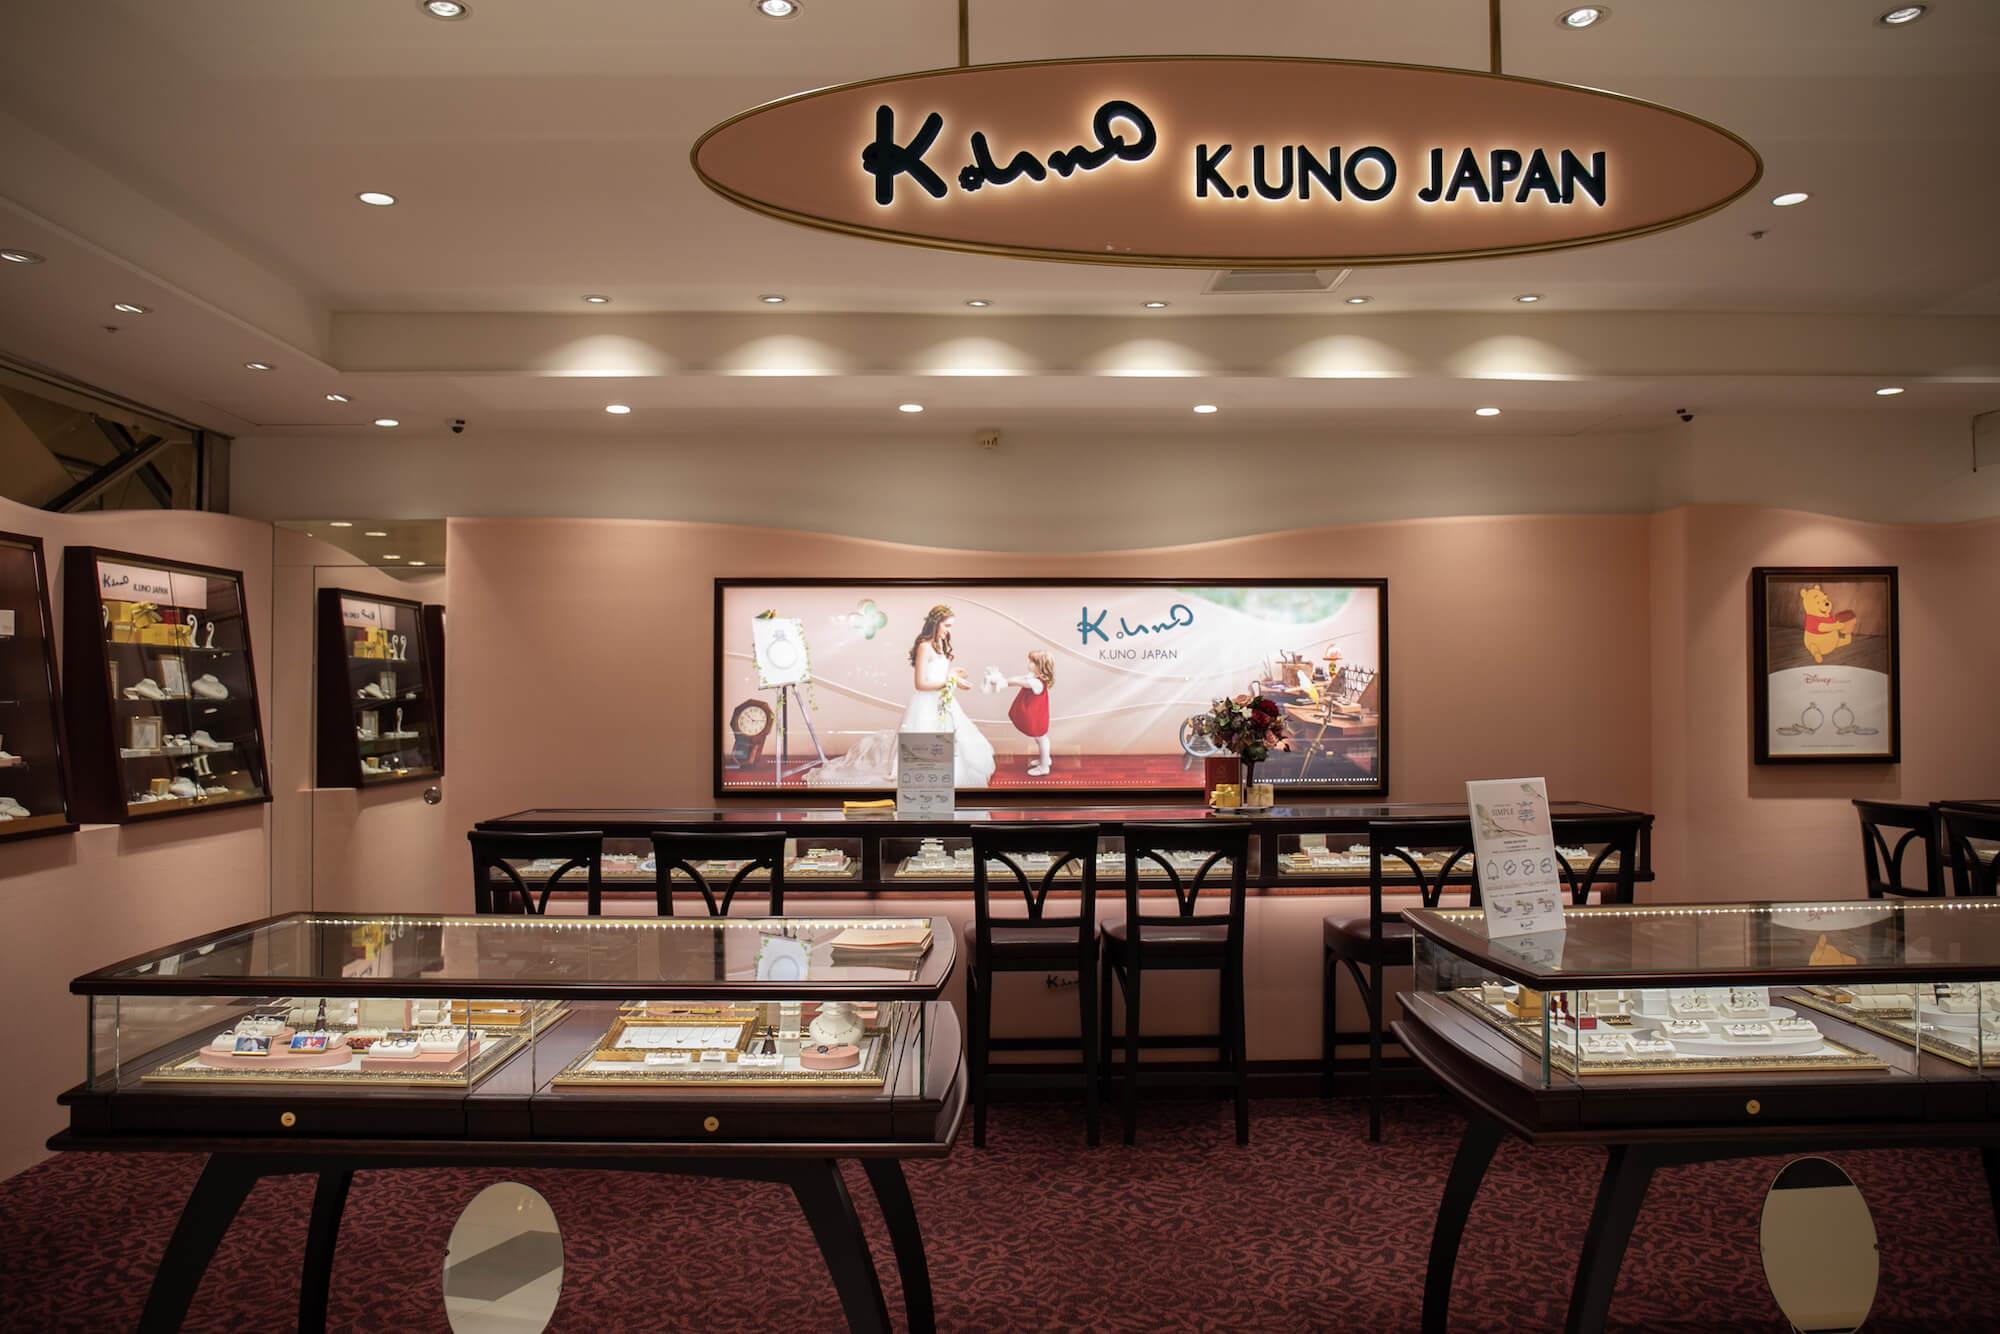 K.uno Japan南西環境照2